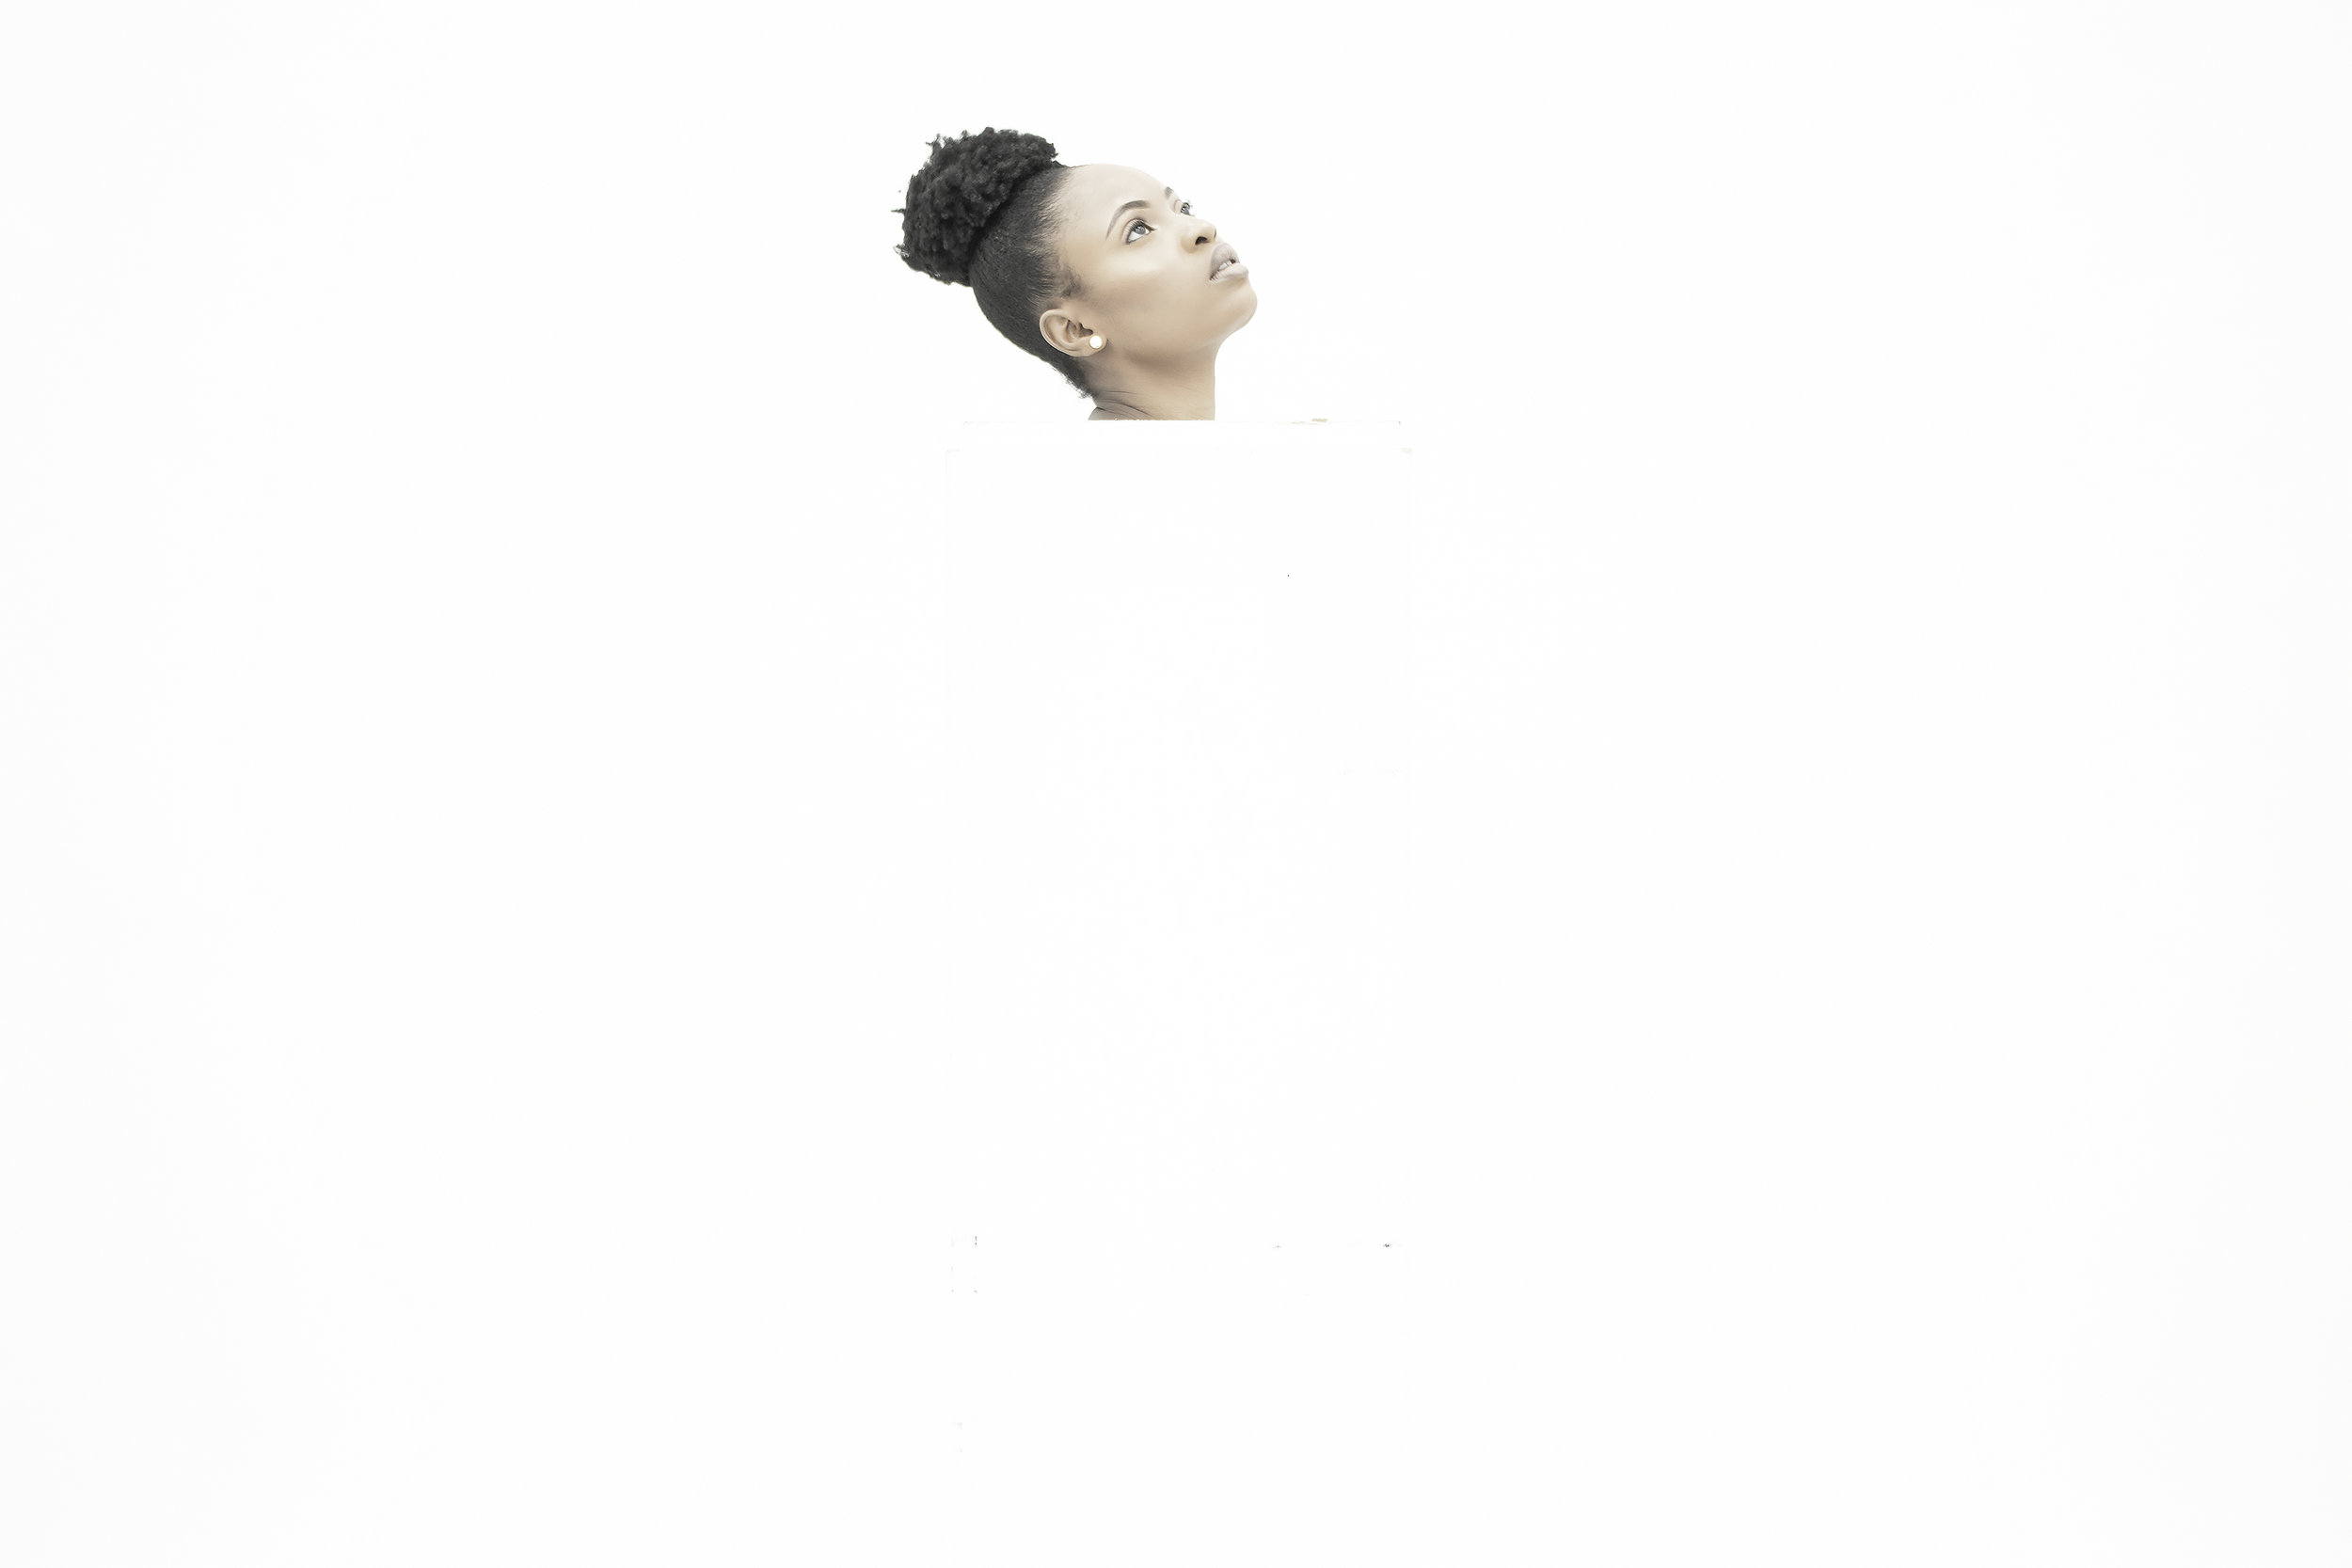 Final-Lone-Head-Print-On-A4.jpg